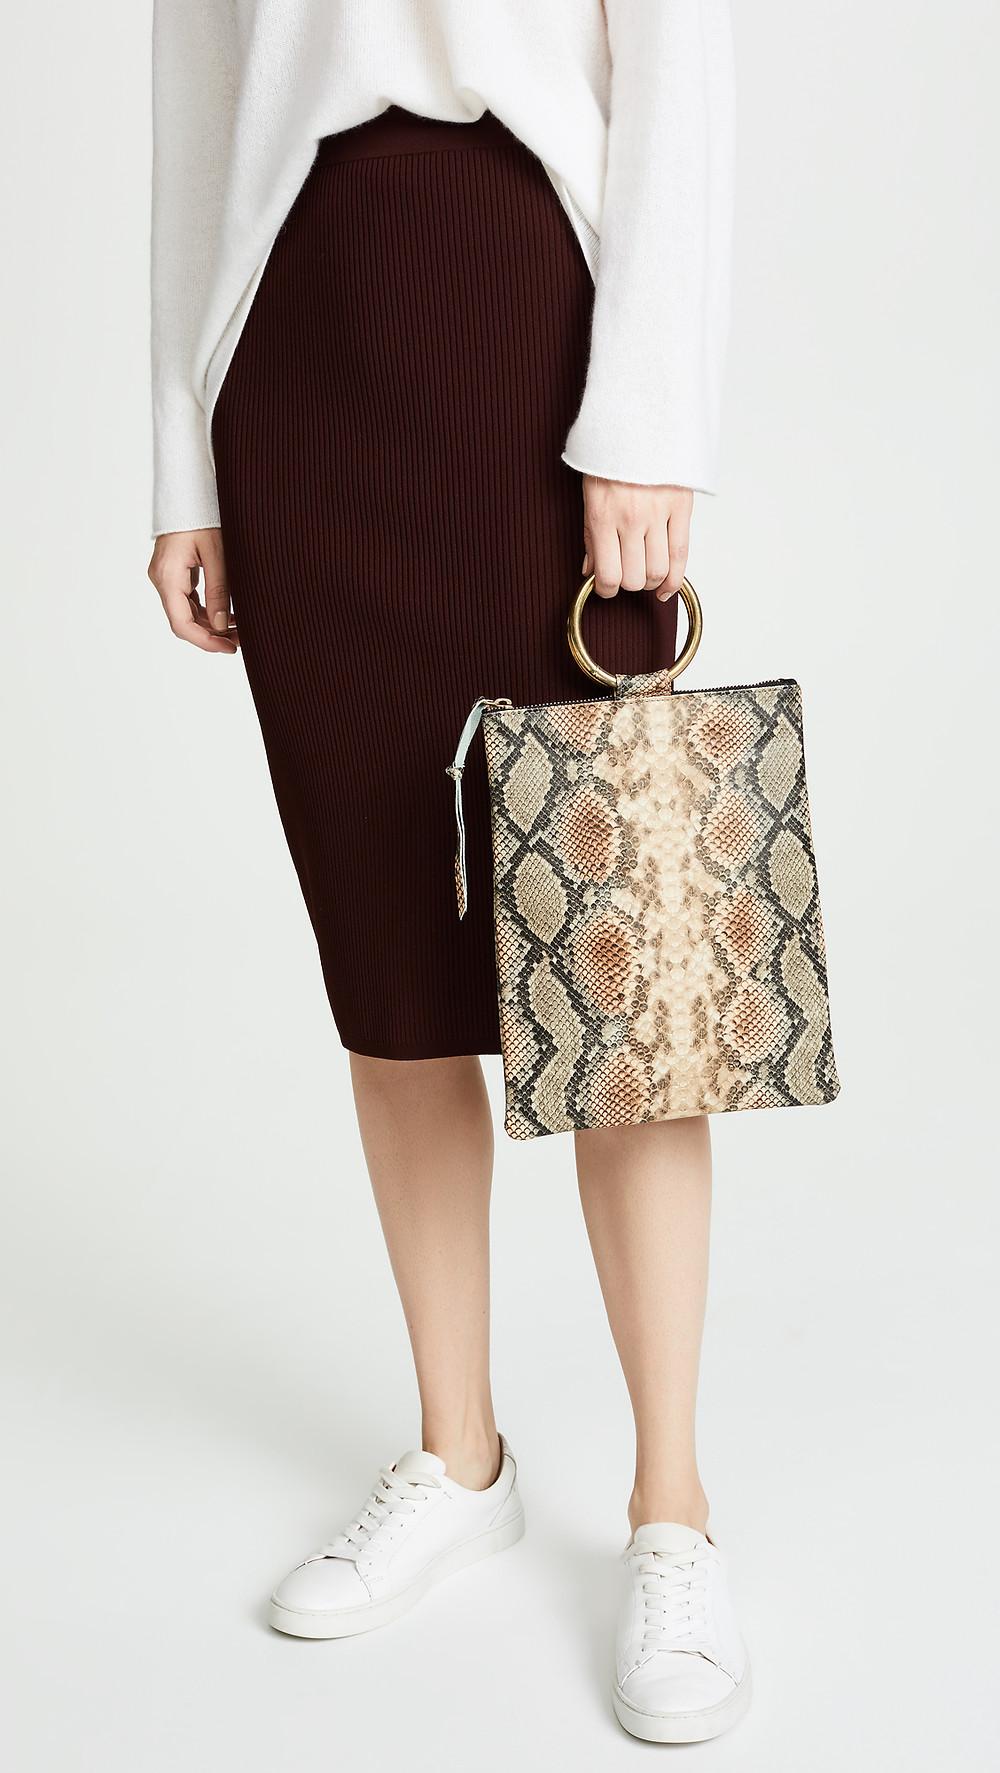 Oliveve Laine Ring Bag $200